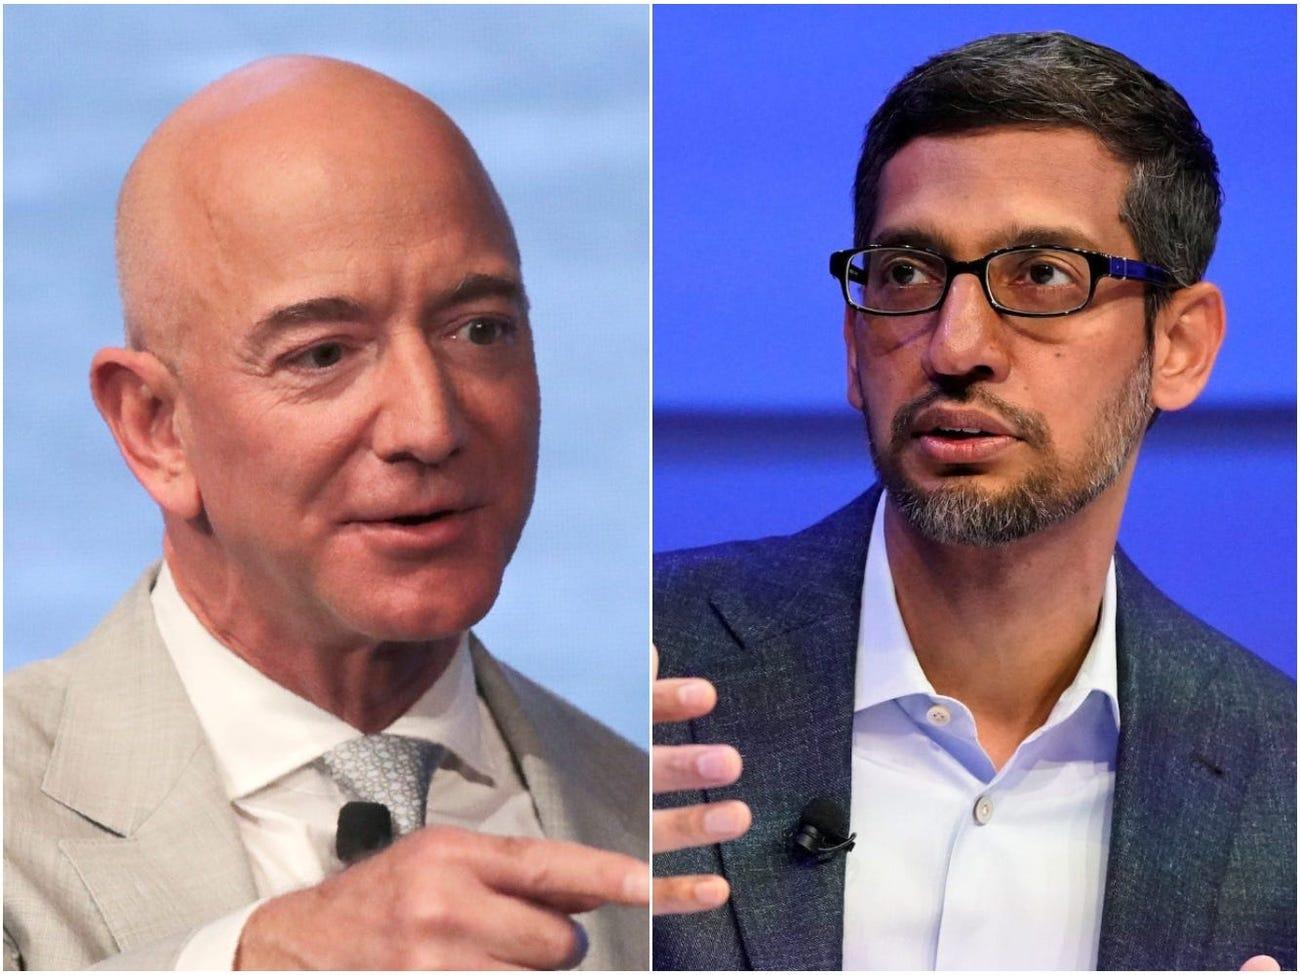 Jeff Bezos (trái) và Sundar Pichai (phải). Ảnh: Reuters.